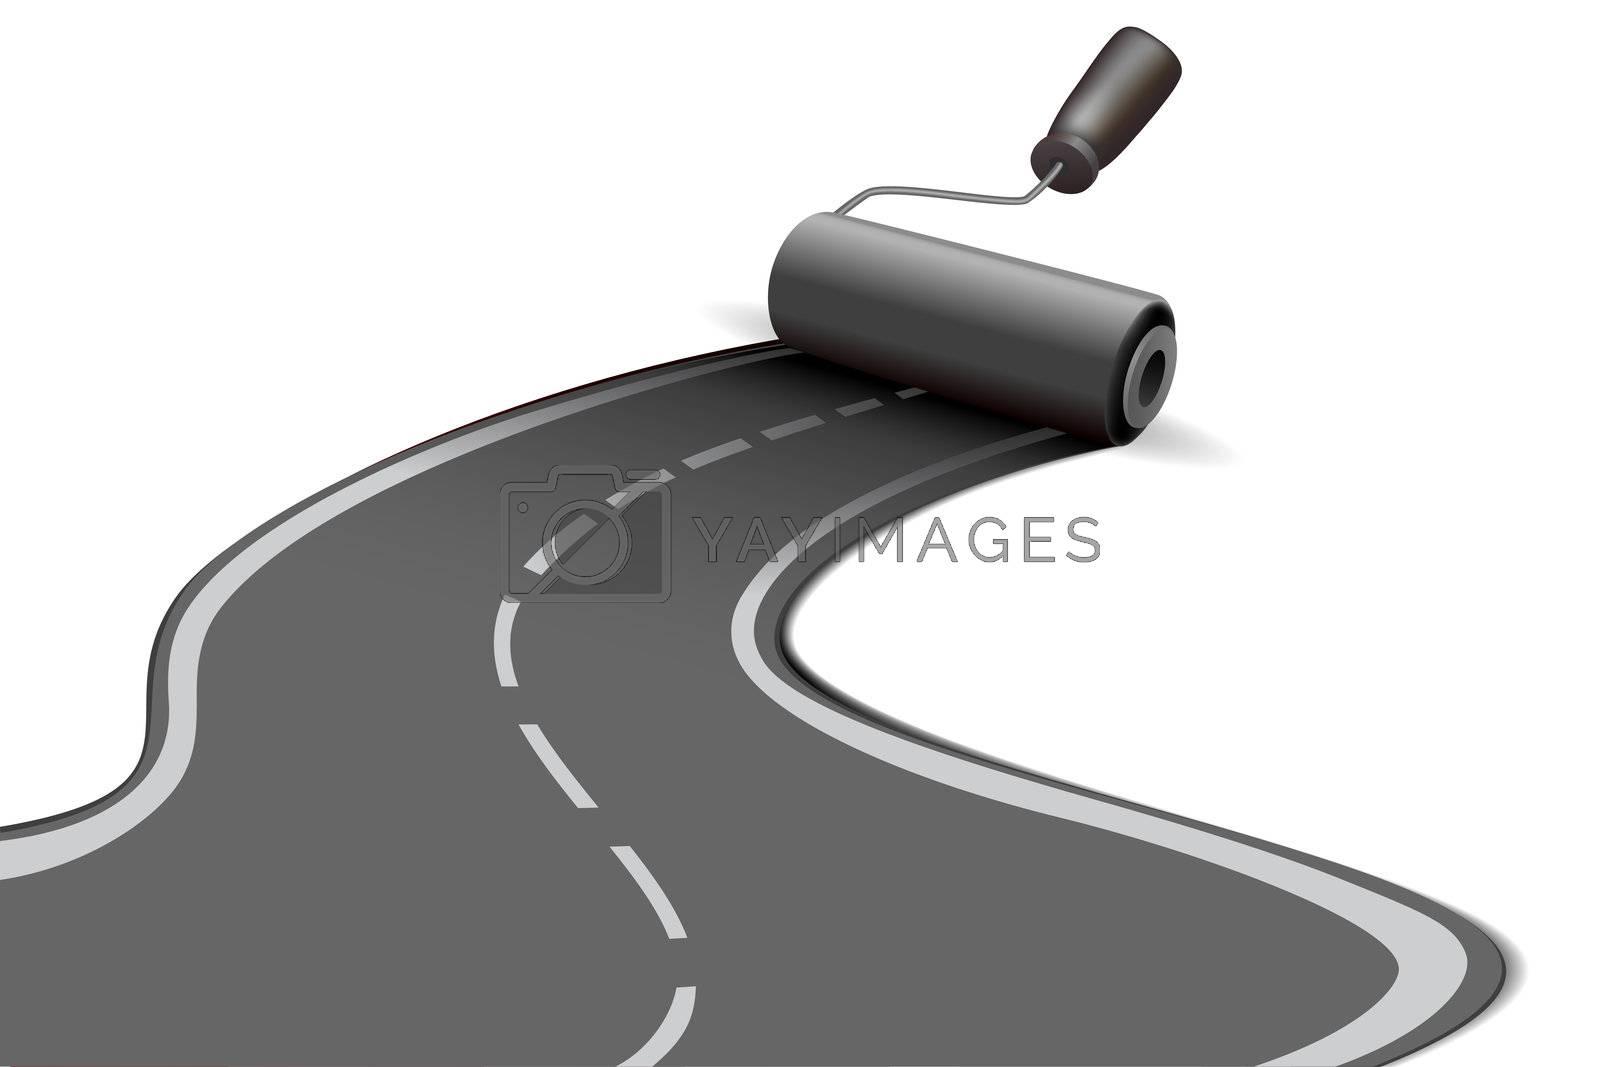 illustration of road roller on white background